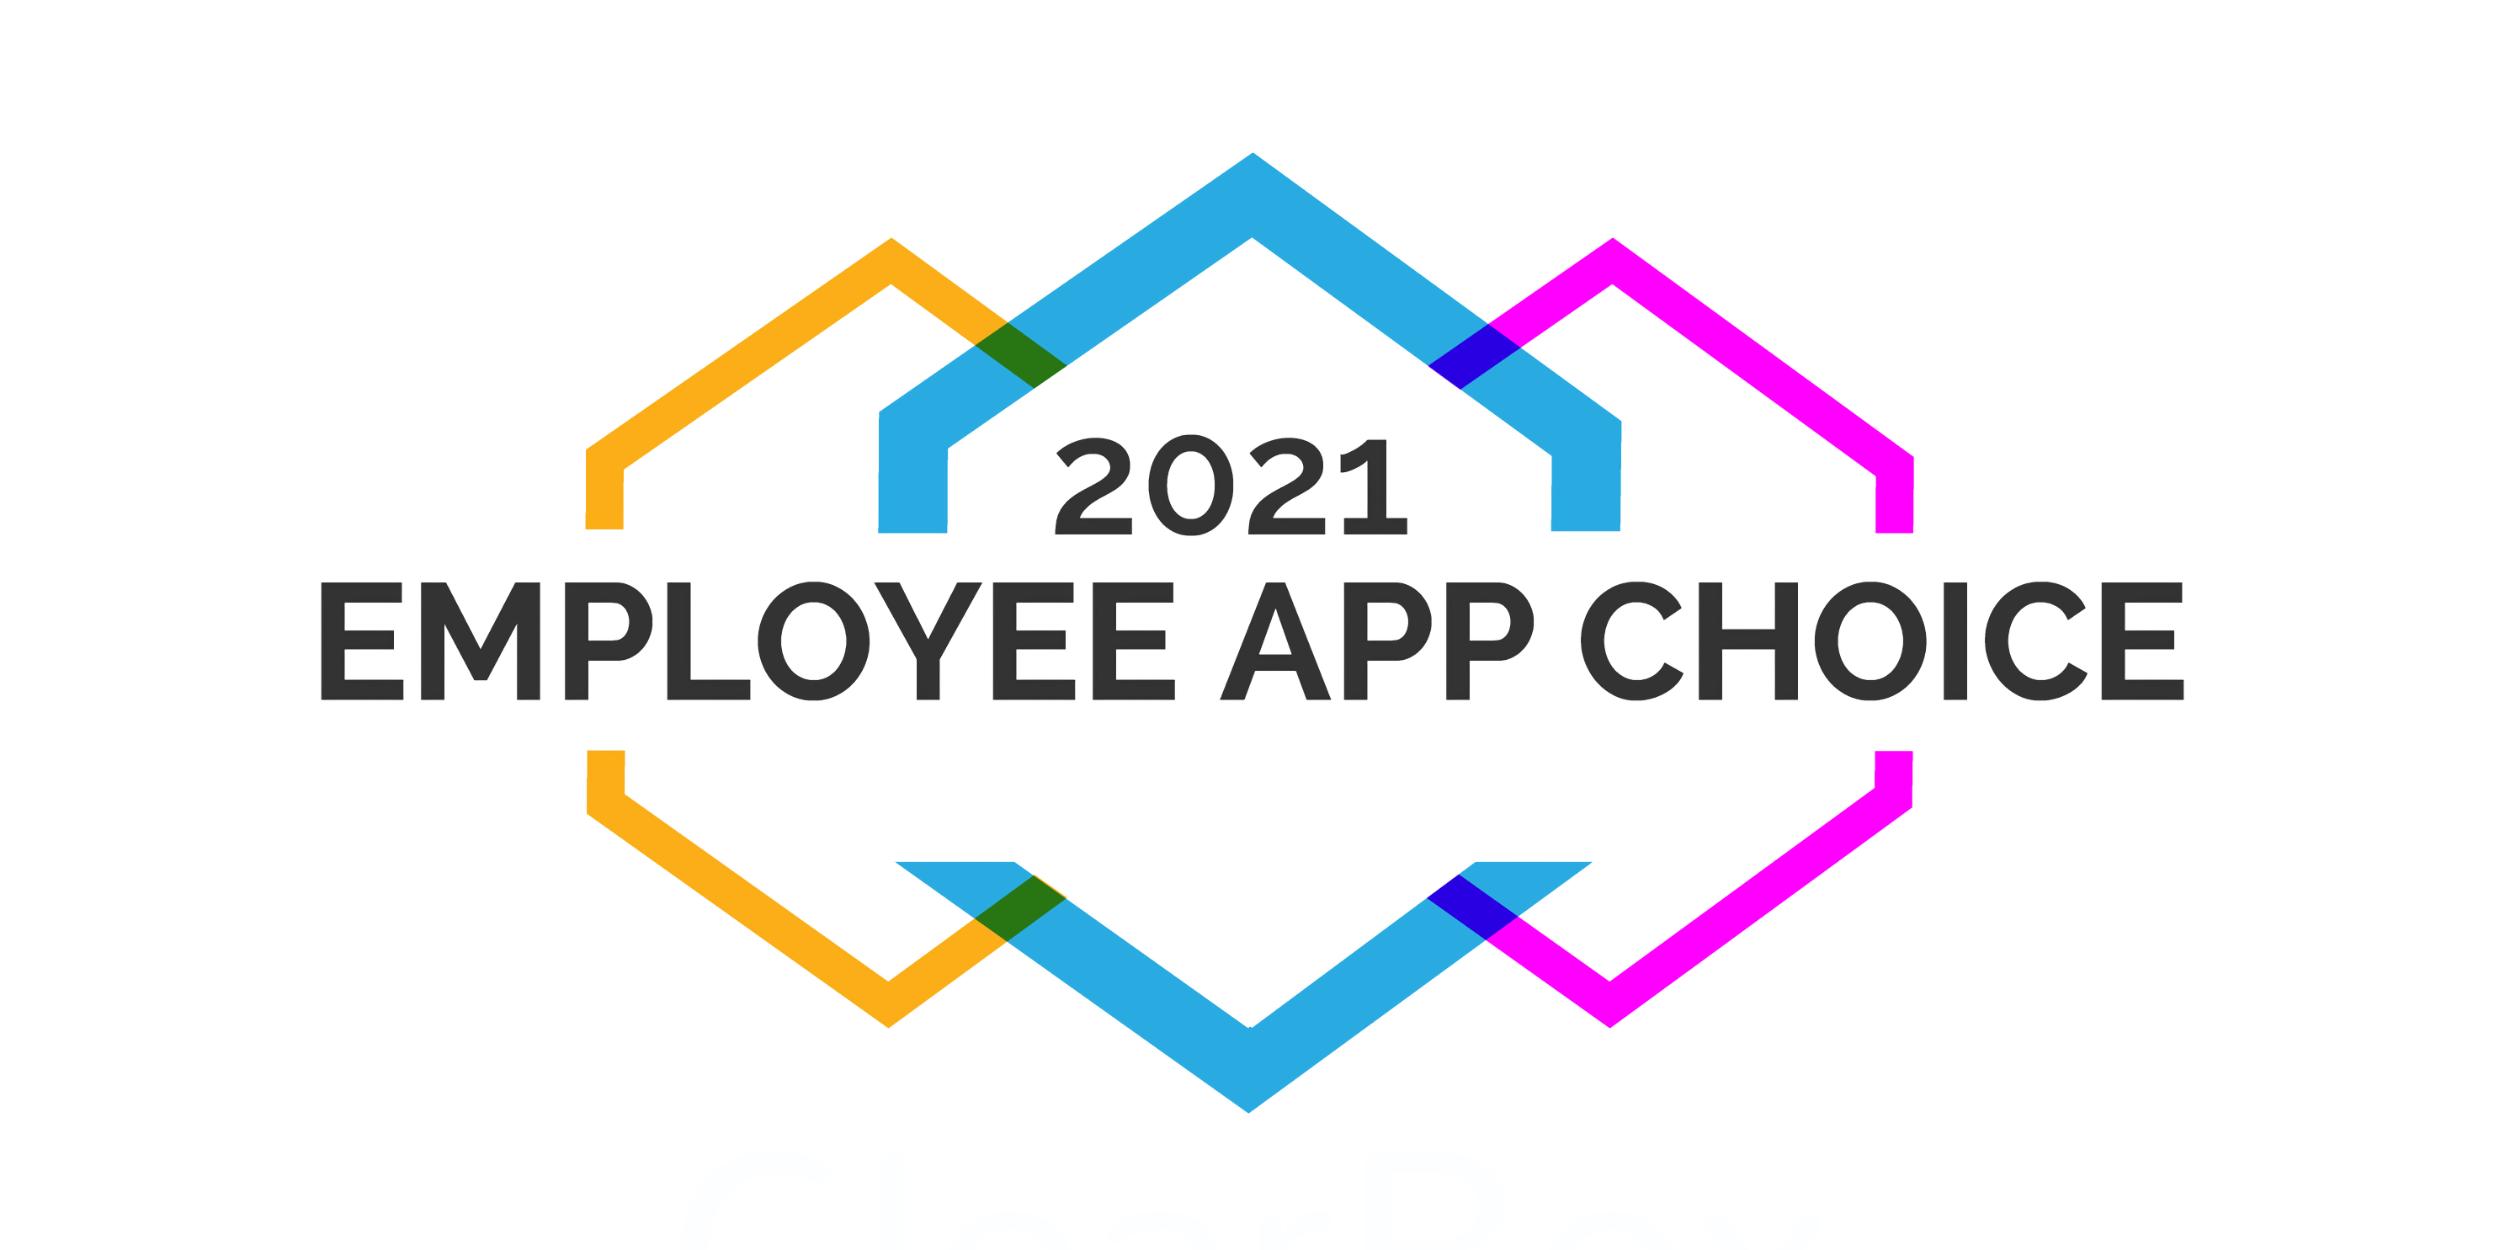 Employee app choice 2021.